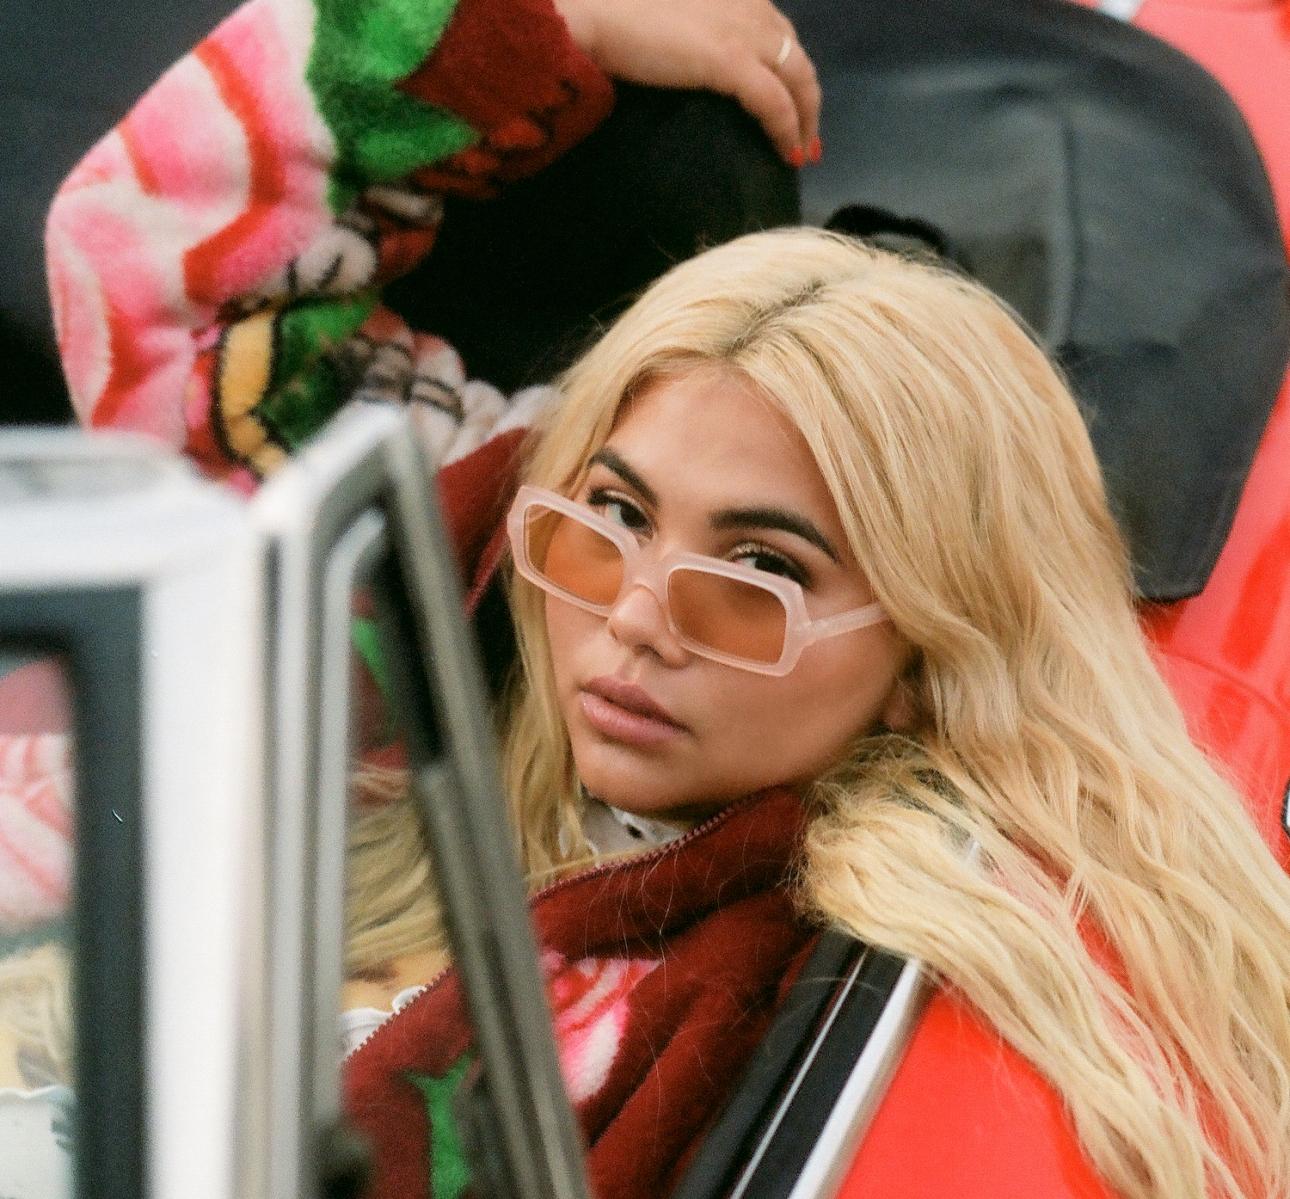 Hayley Kiyoko teases new single dropping on Friday